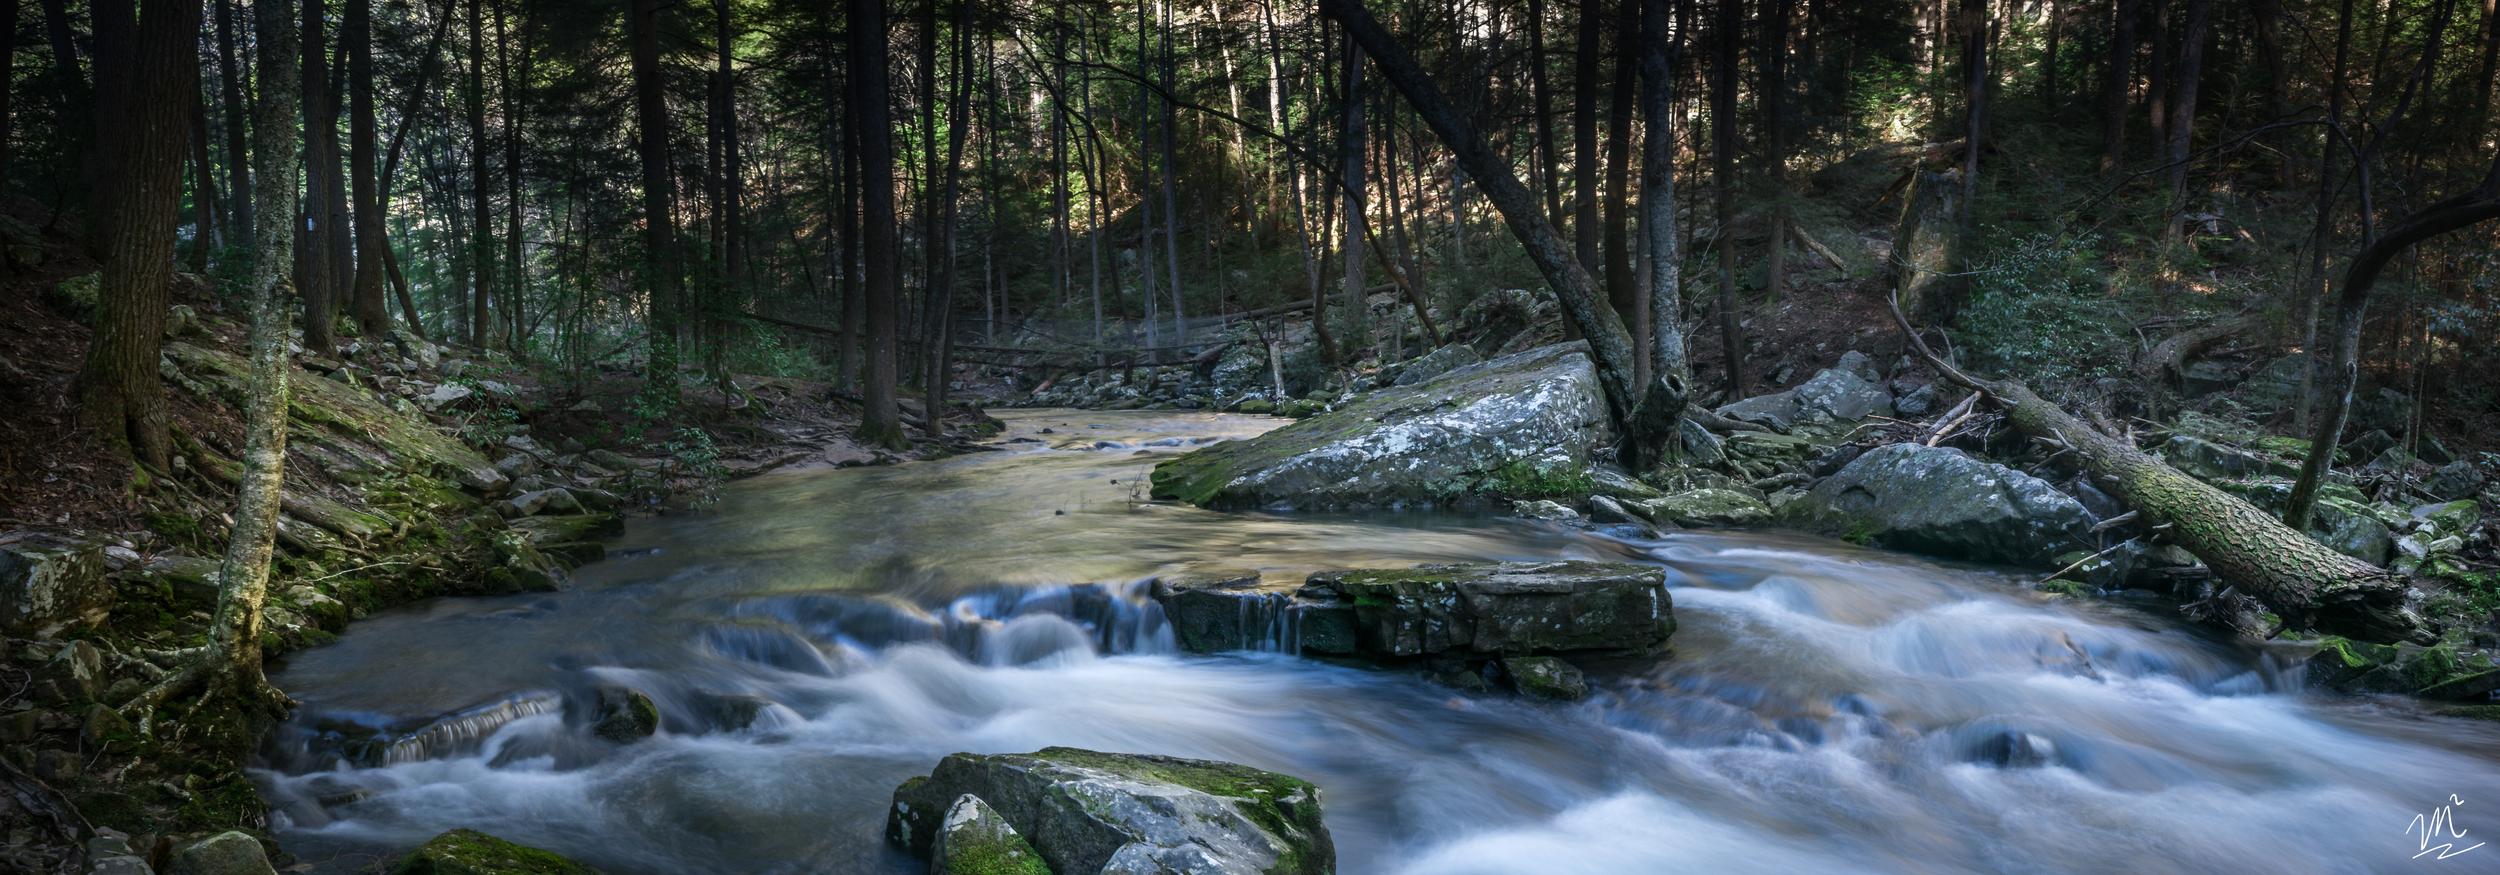 Foster Falls - Little Gizzard Creek #2.jpg